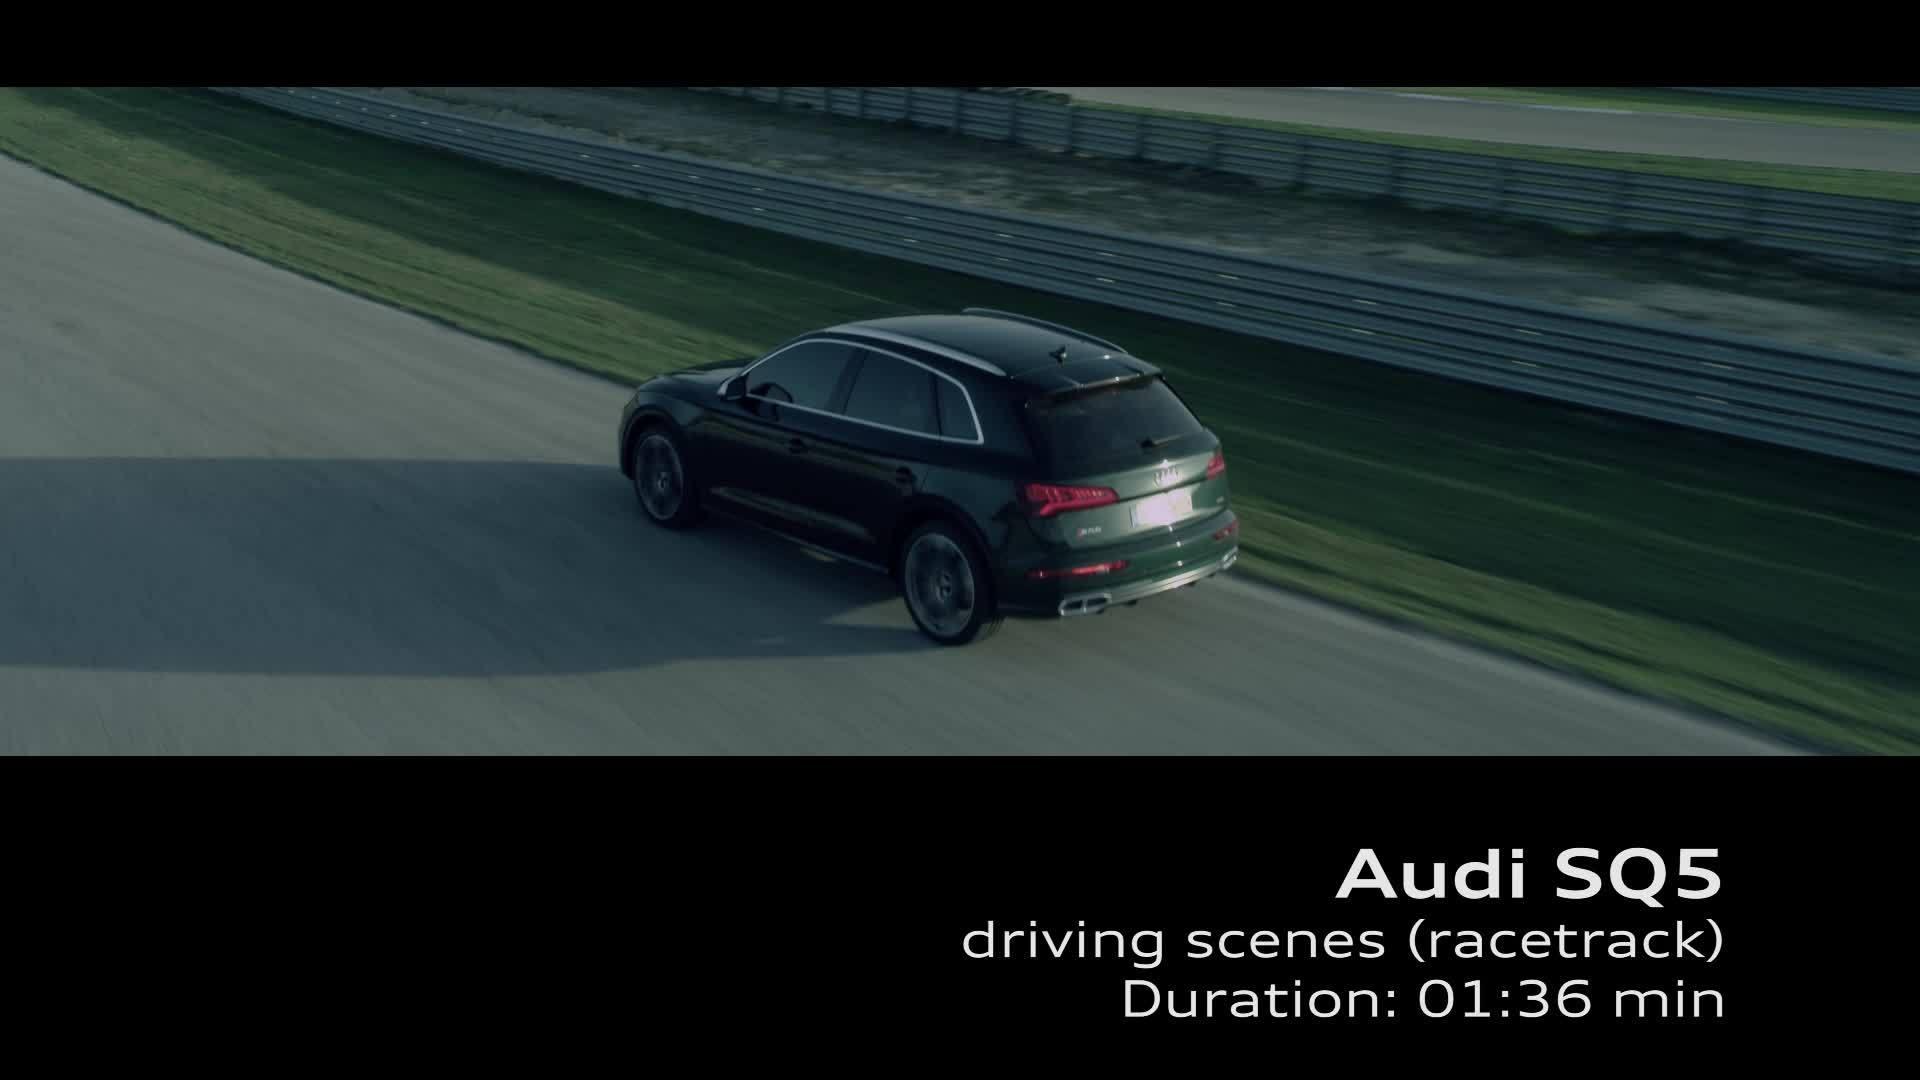 The Audi SQ5 - Footage